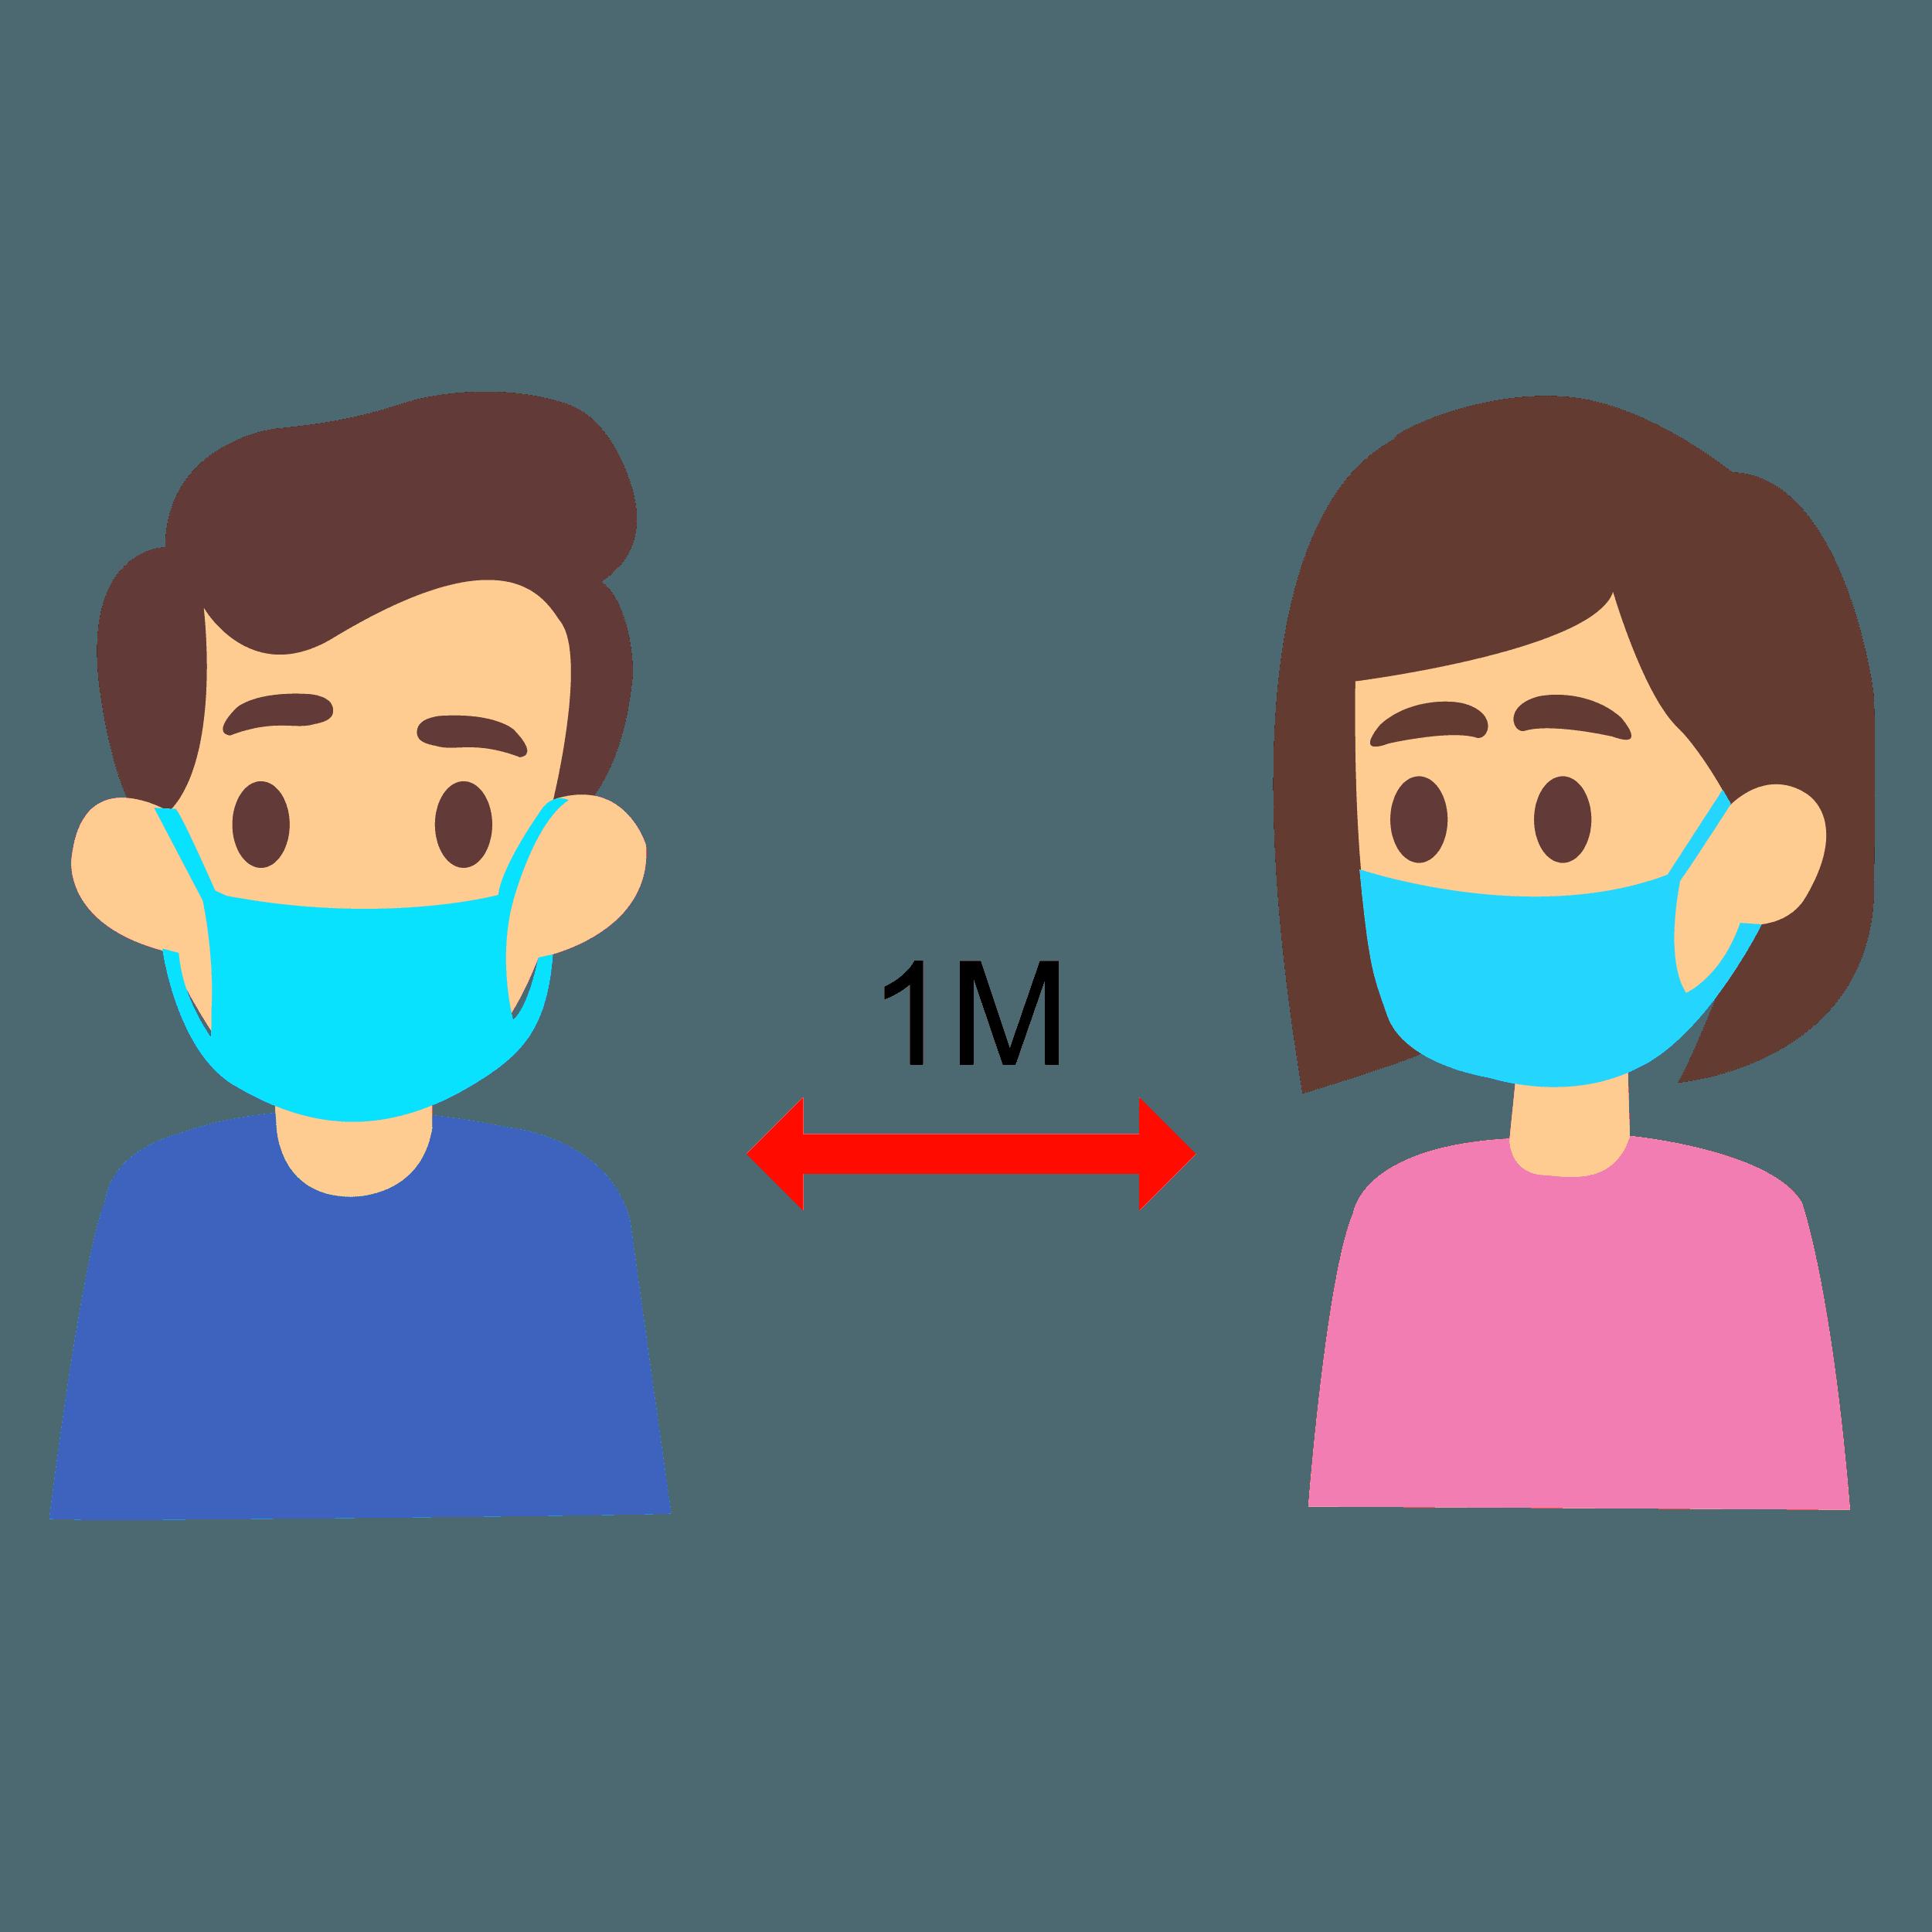 Coronavirus enfants 1m